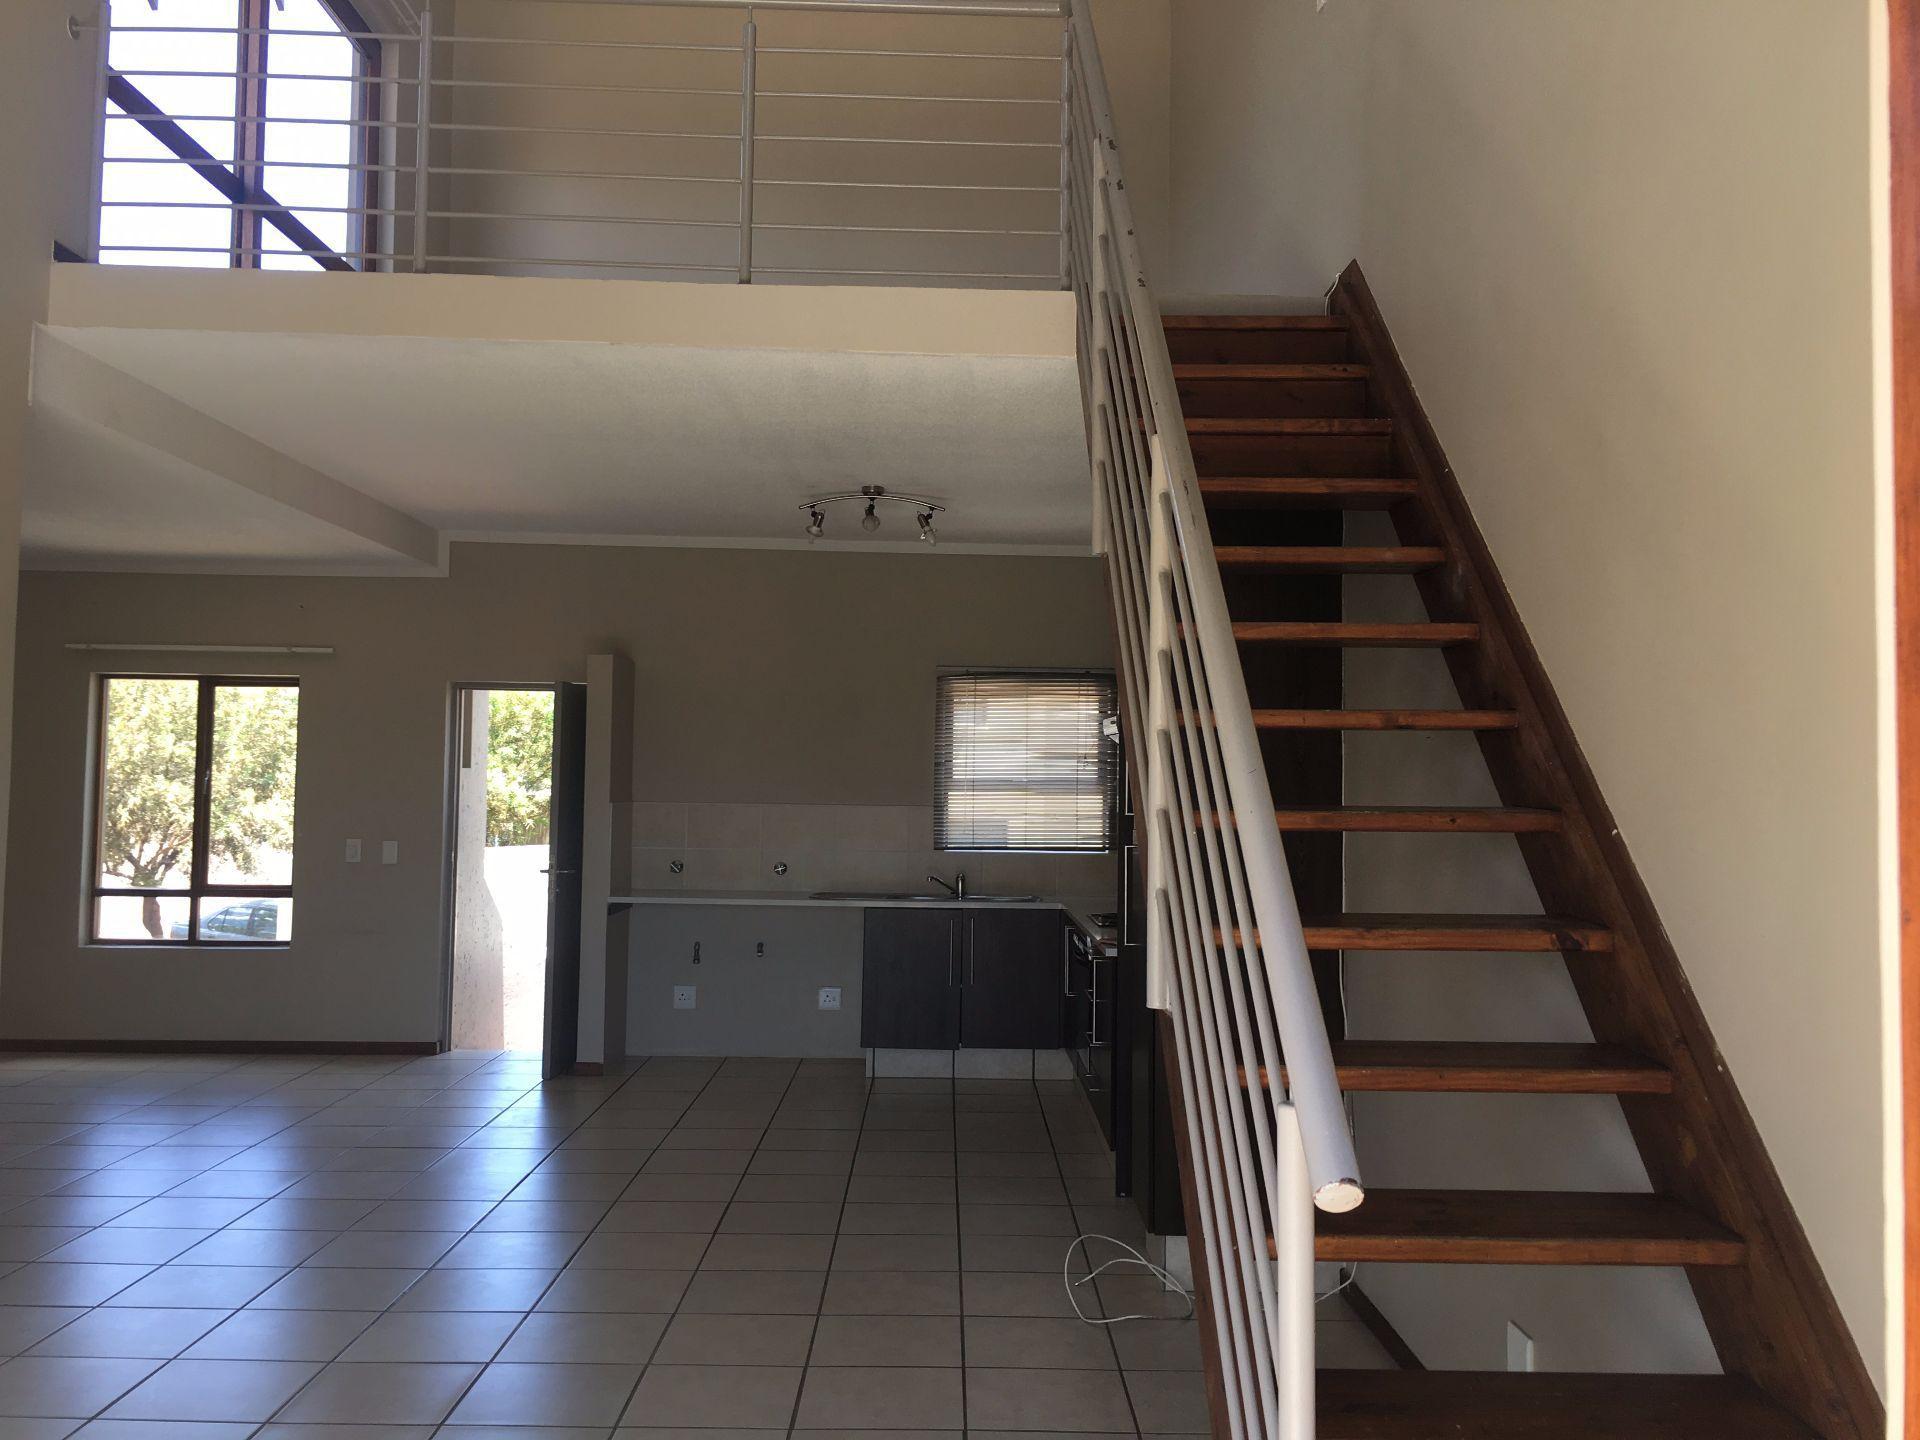 Broadacres property for sale. Ref No: 13552745. Picture no 4